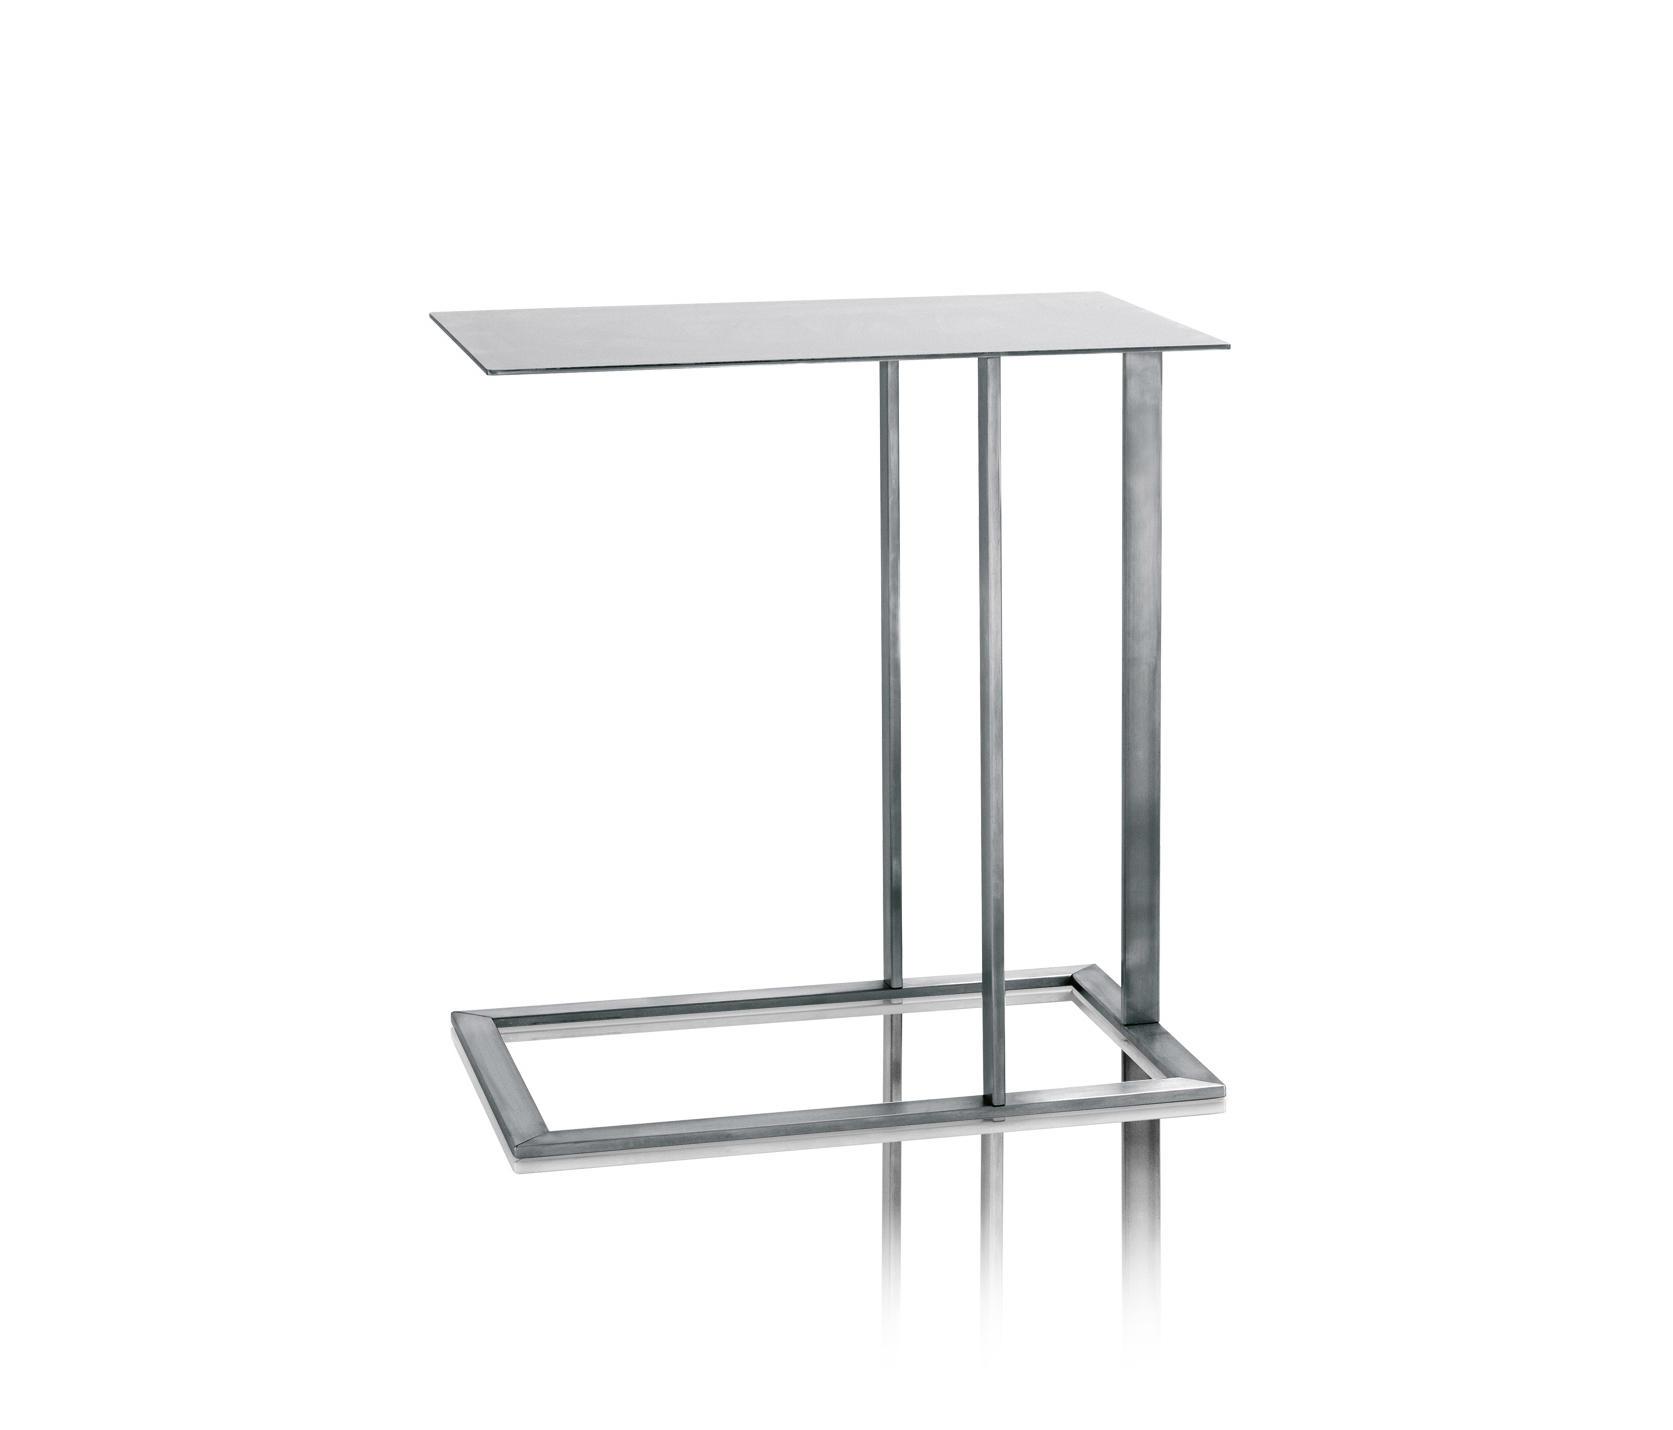 Cool Loft Side Tables From Arketipo Architonic Inzonedesignstudio Interior Chair Design Inzonedesignstudiocom